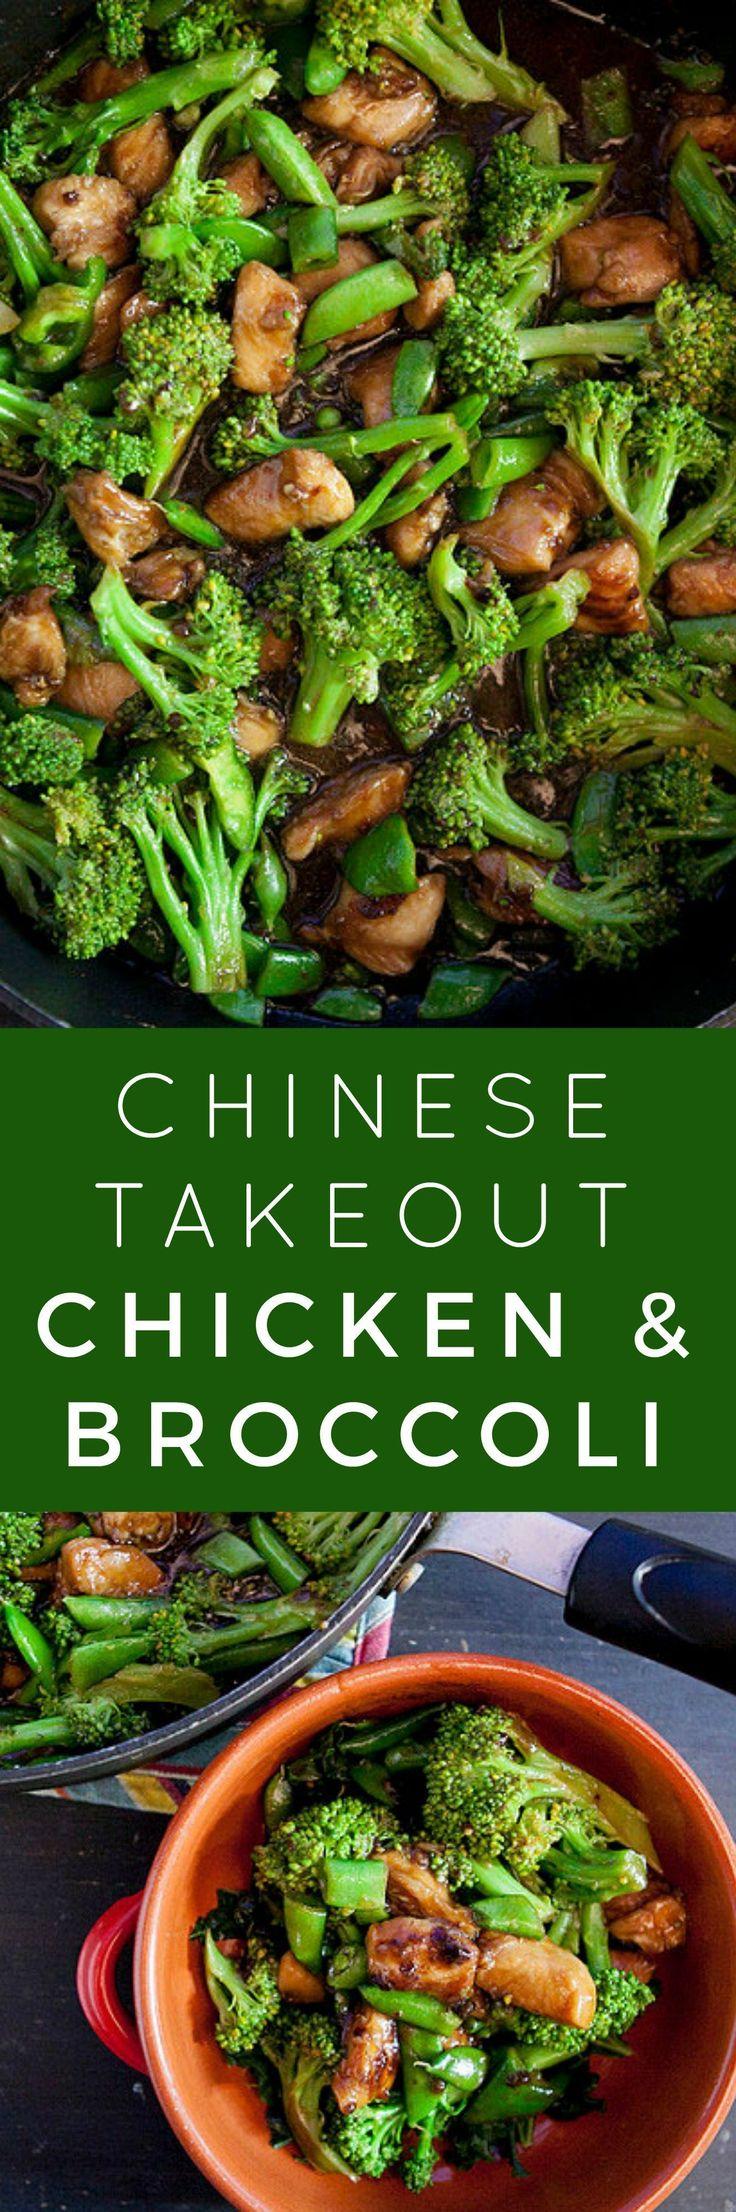 good taste chinese food bayville